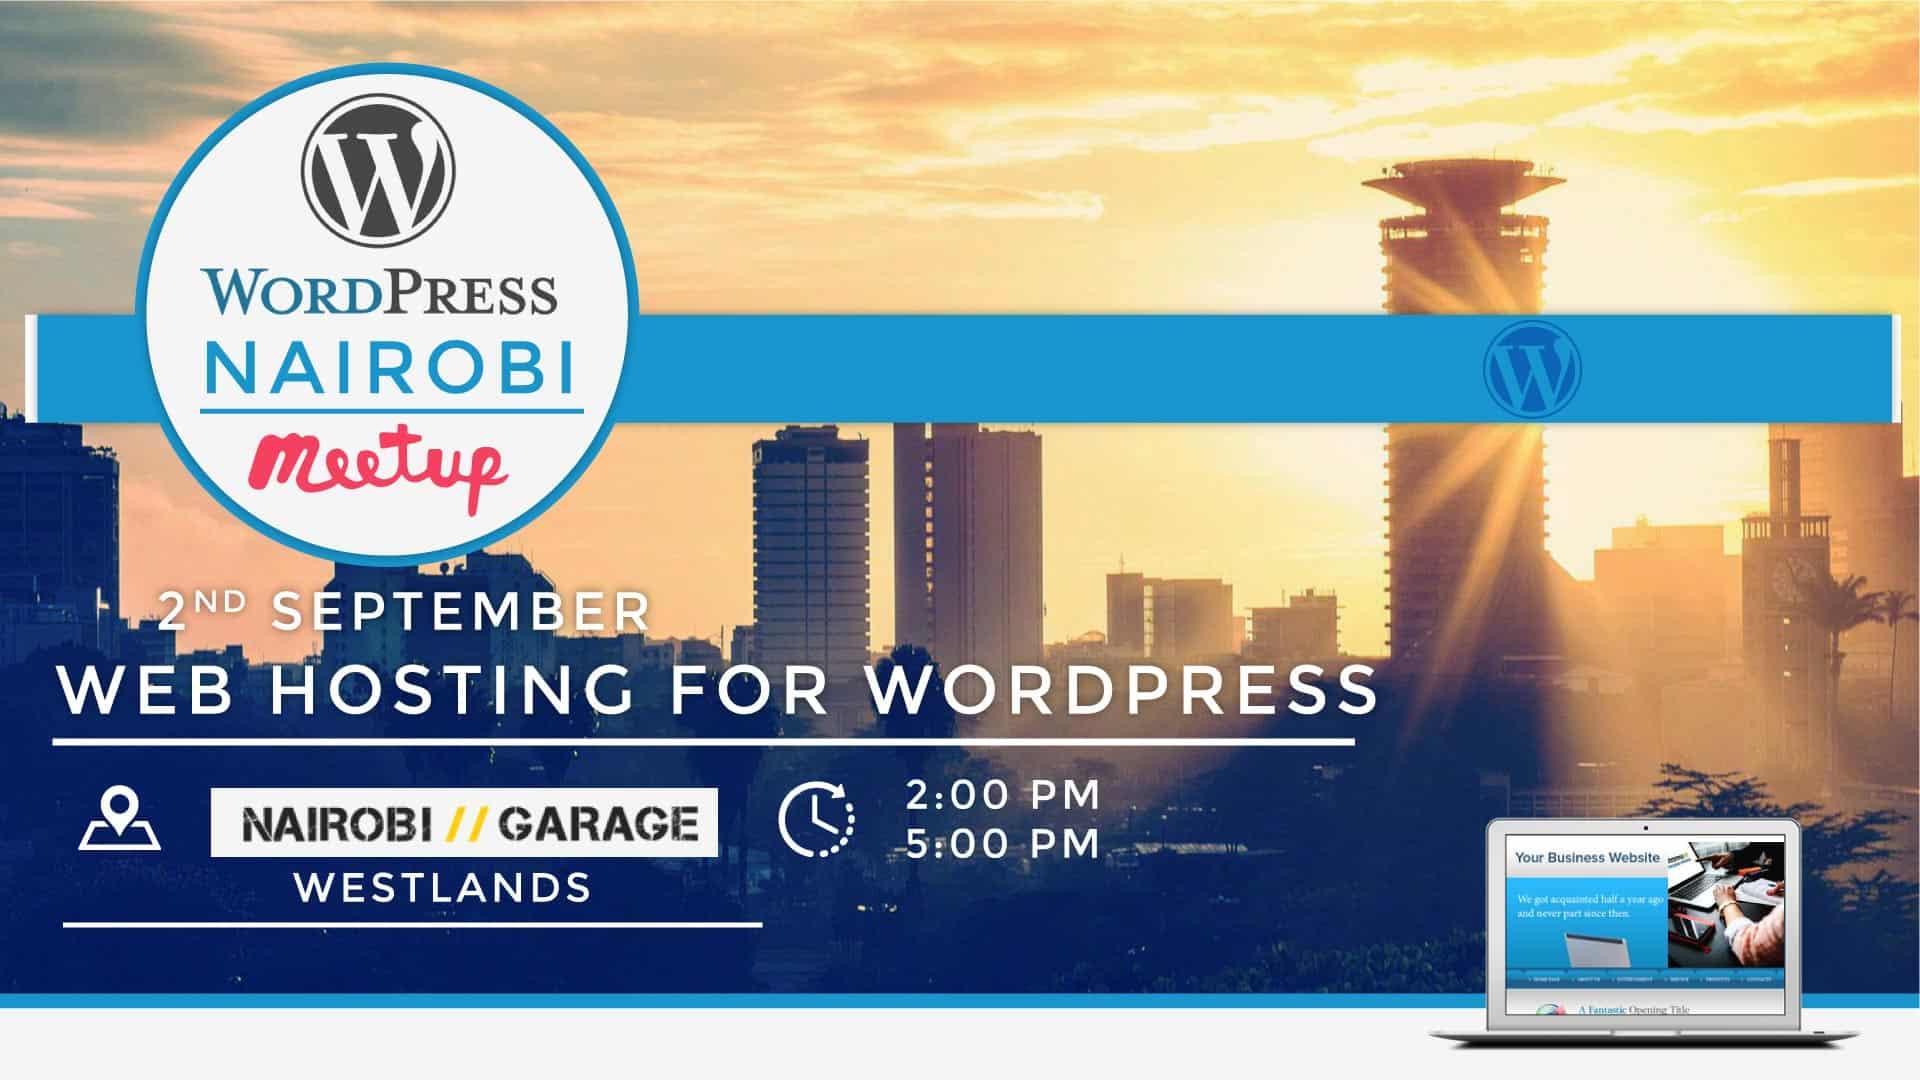 wordpress webhosting